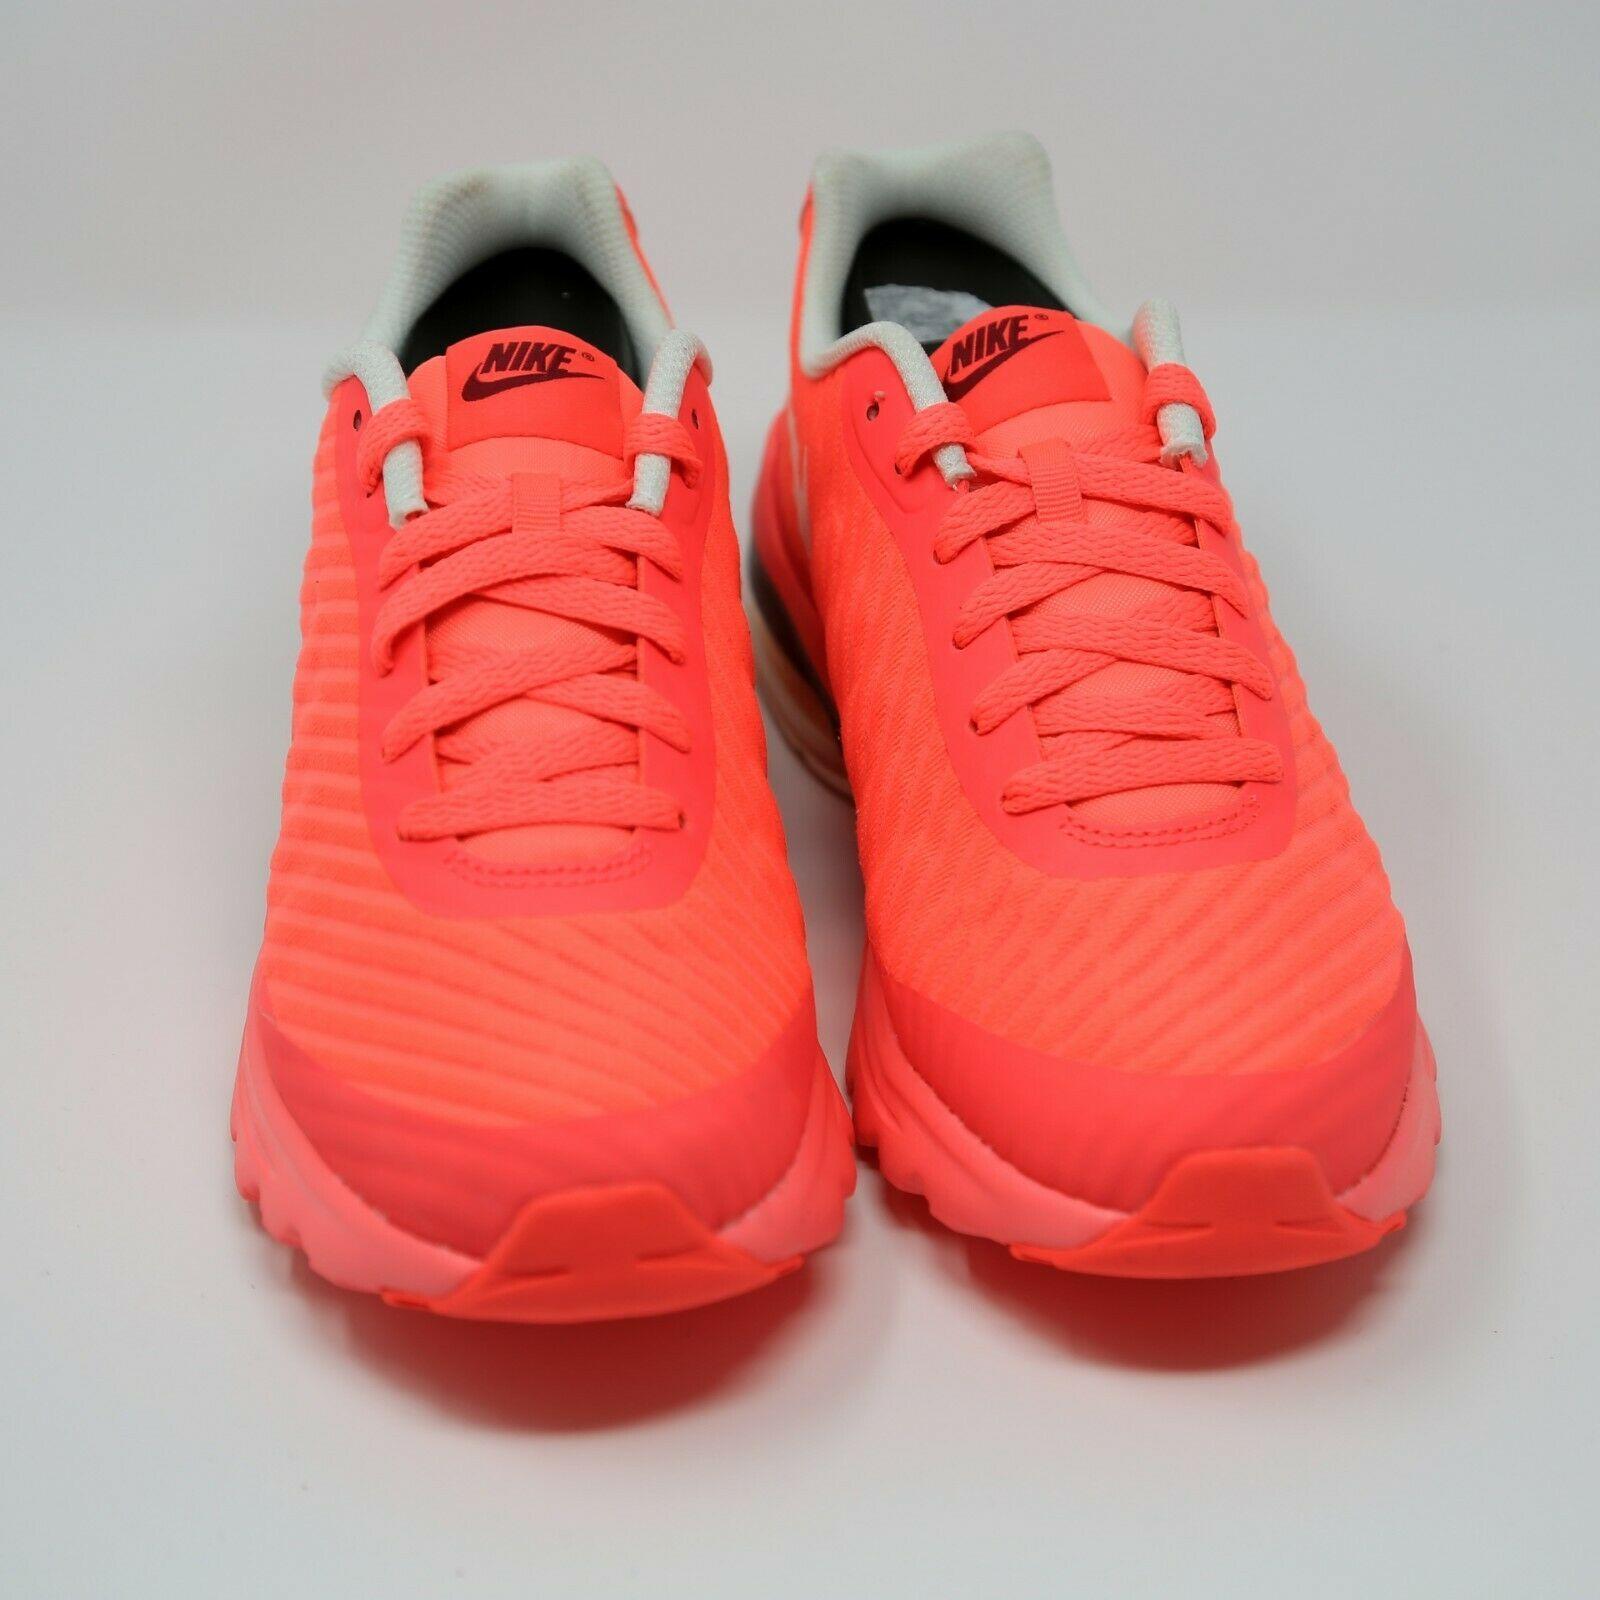 Nike Damen Air Max Invigor Se Laufschuhe Hot and 50 similar